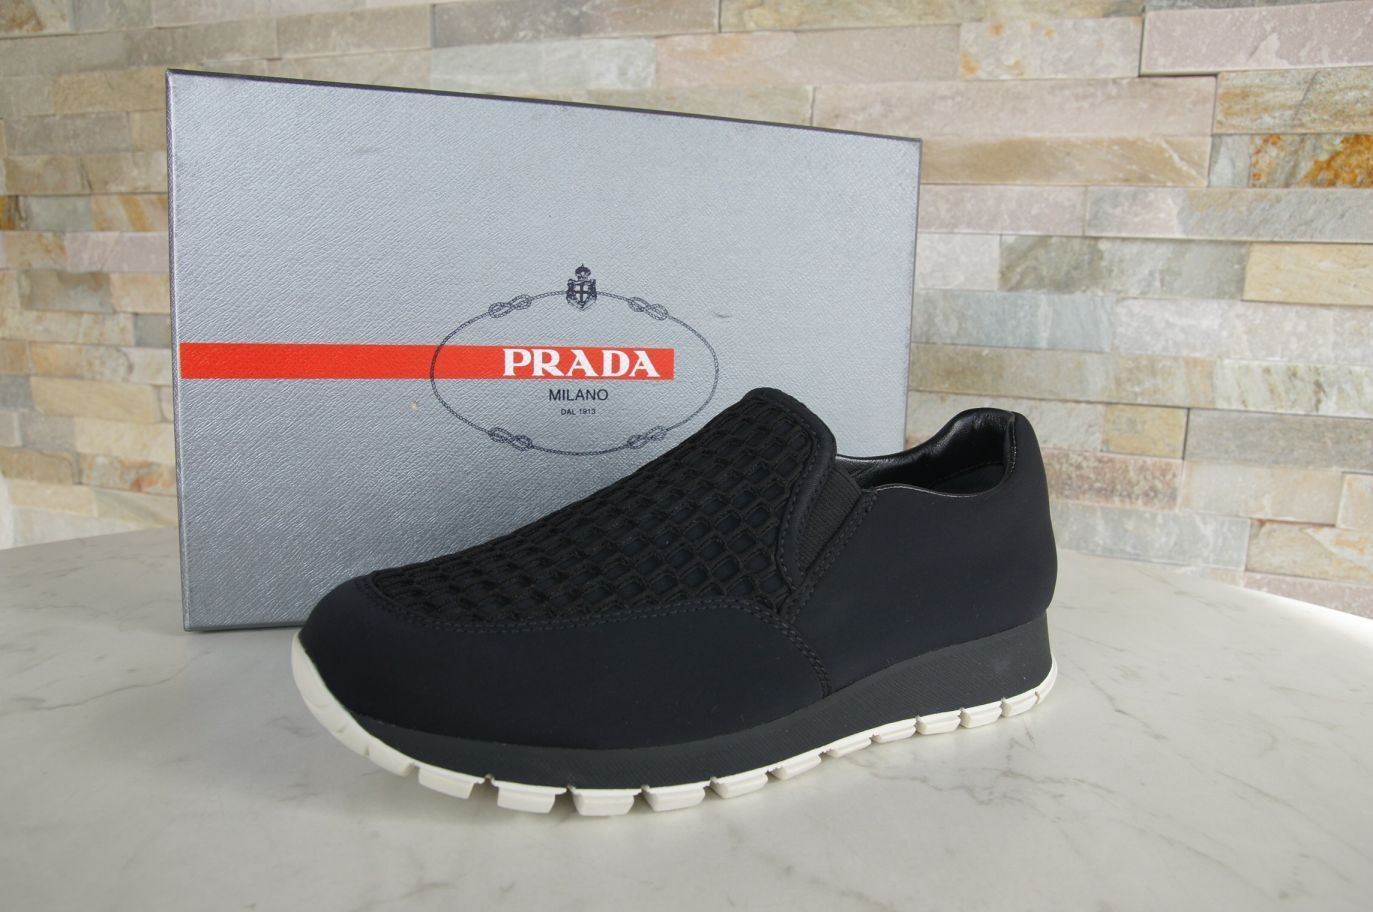 PRADA Wabe Gr 37 Slipper Sneakers Wabe PRADA Slip On Mokassins Schuhe schwarz NEU 4c402a